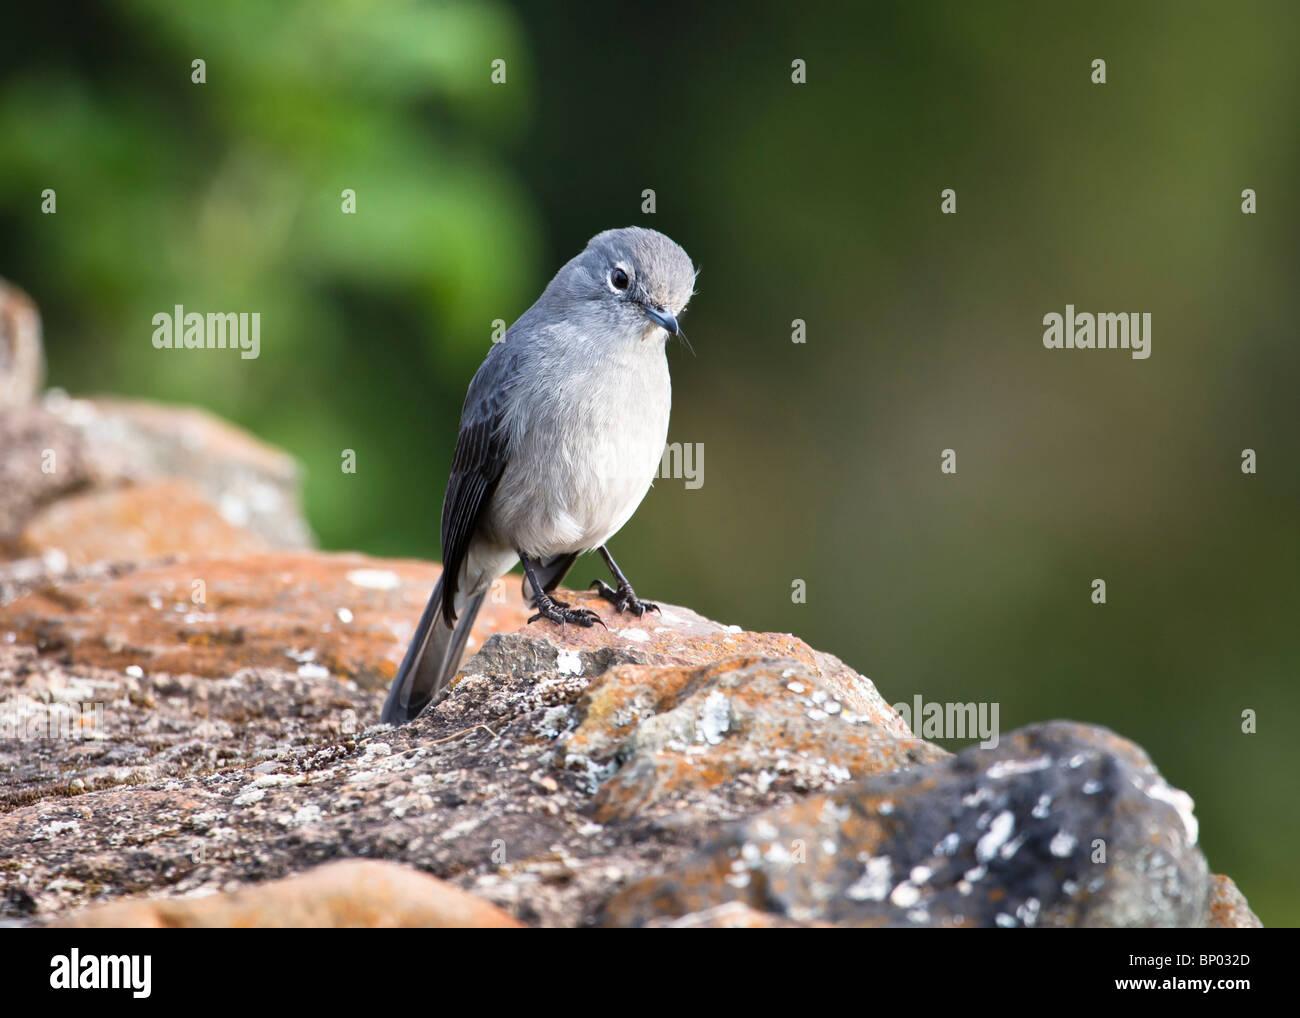 White-Eyed Slaty Flycatcher (Melaenornis fischeri), Ngorongoro, Tanzania, July 2007 - Stock Image